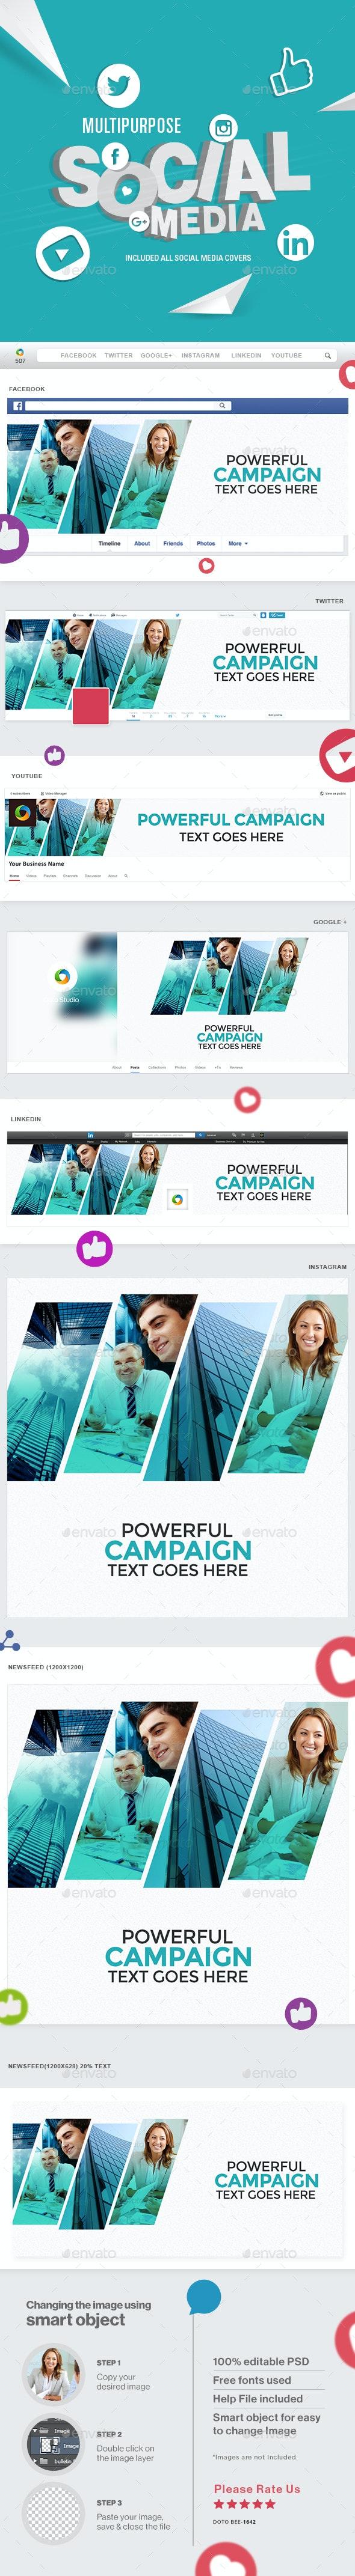 Multipurpose Social Media Pack - Miscellaneous Social Media